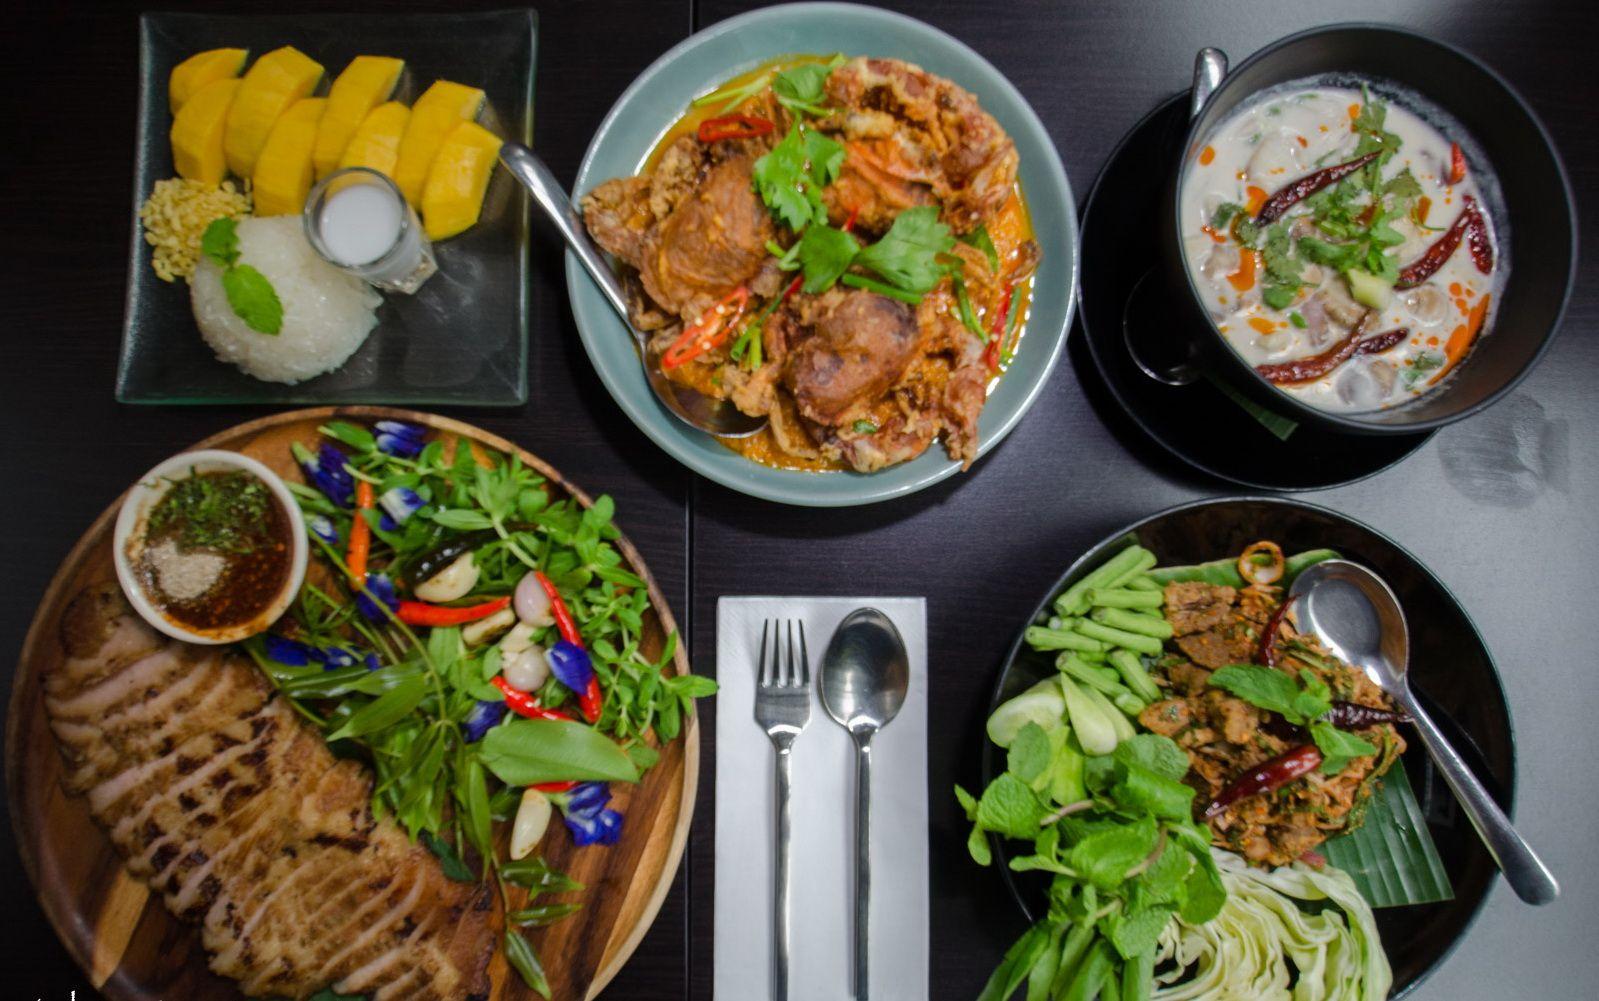 Shopping Cafe In Bangkok Top 4 Best Cafe Shopping Complex In Bangkok You Should Visit